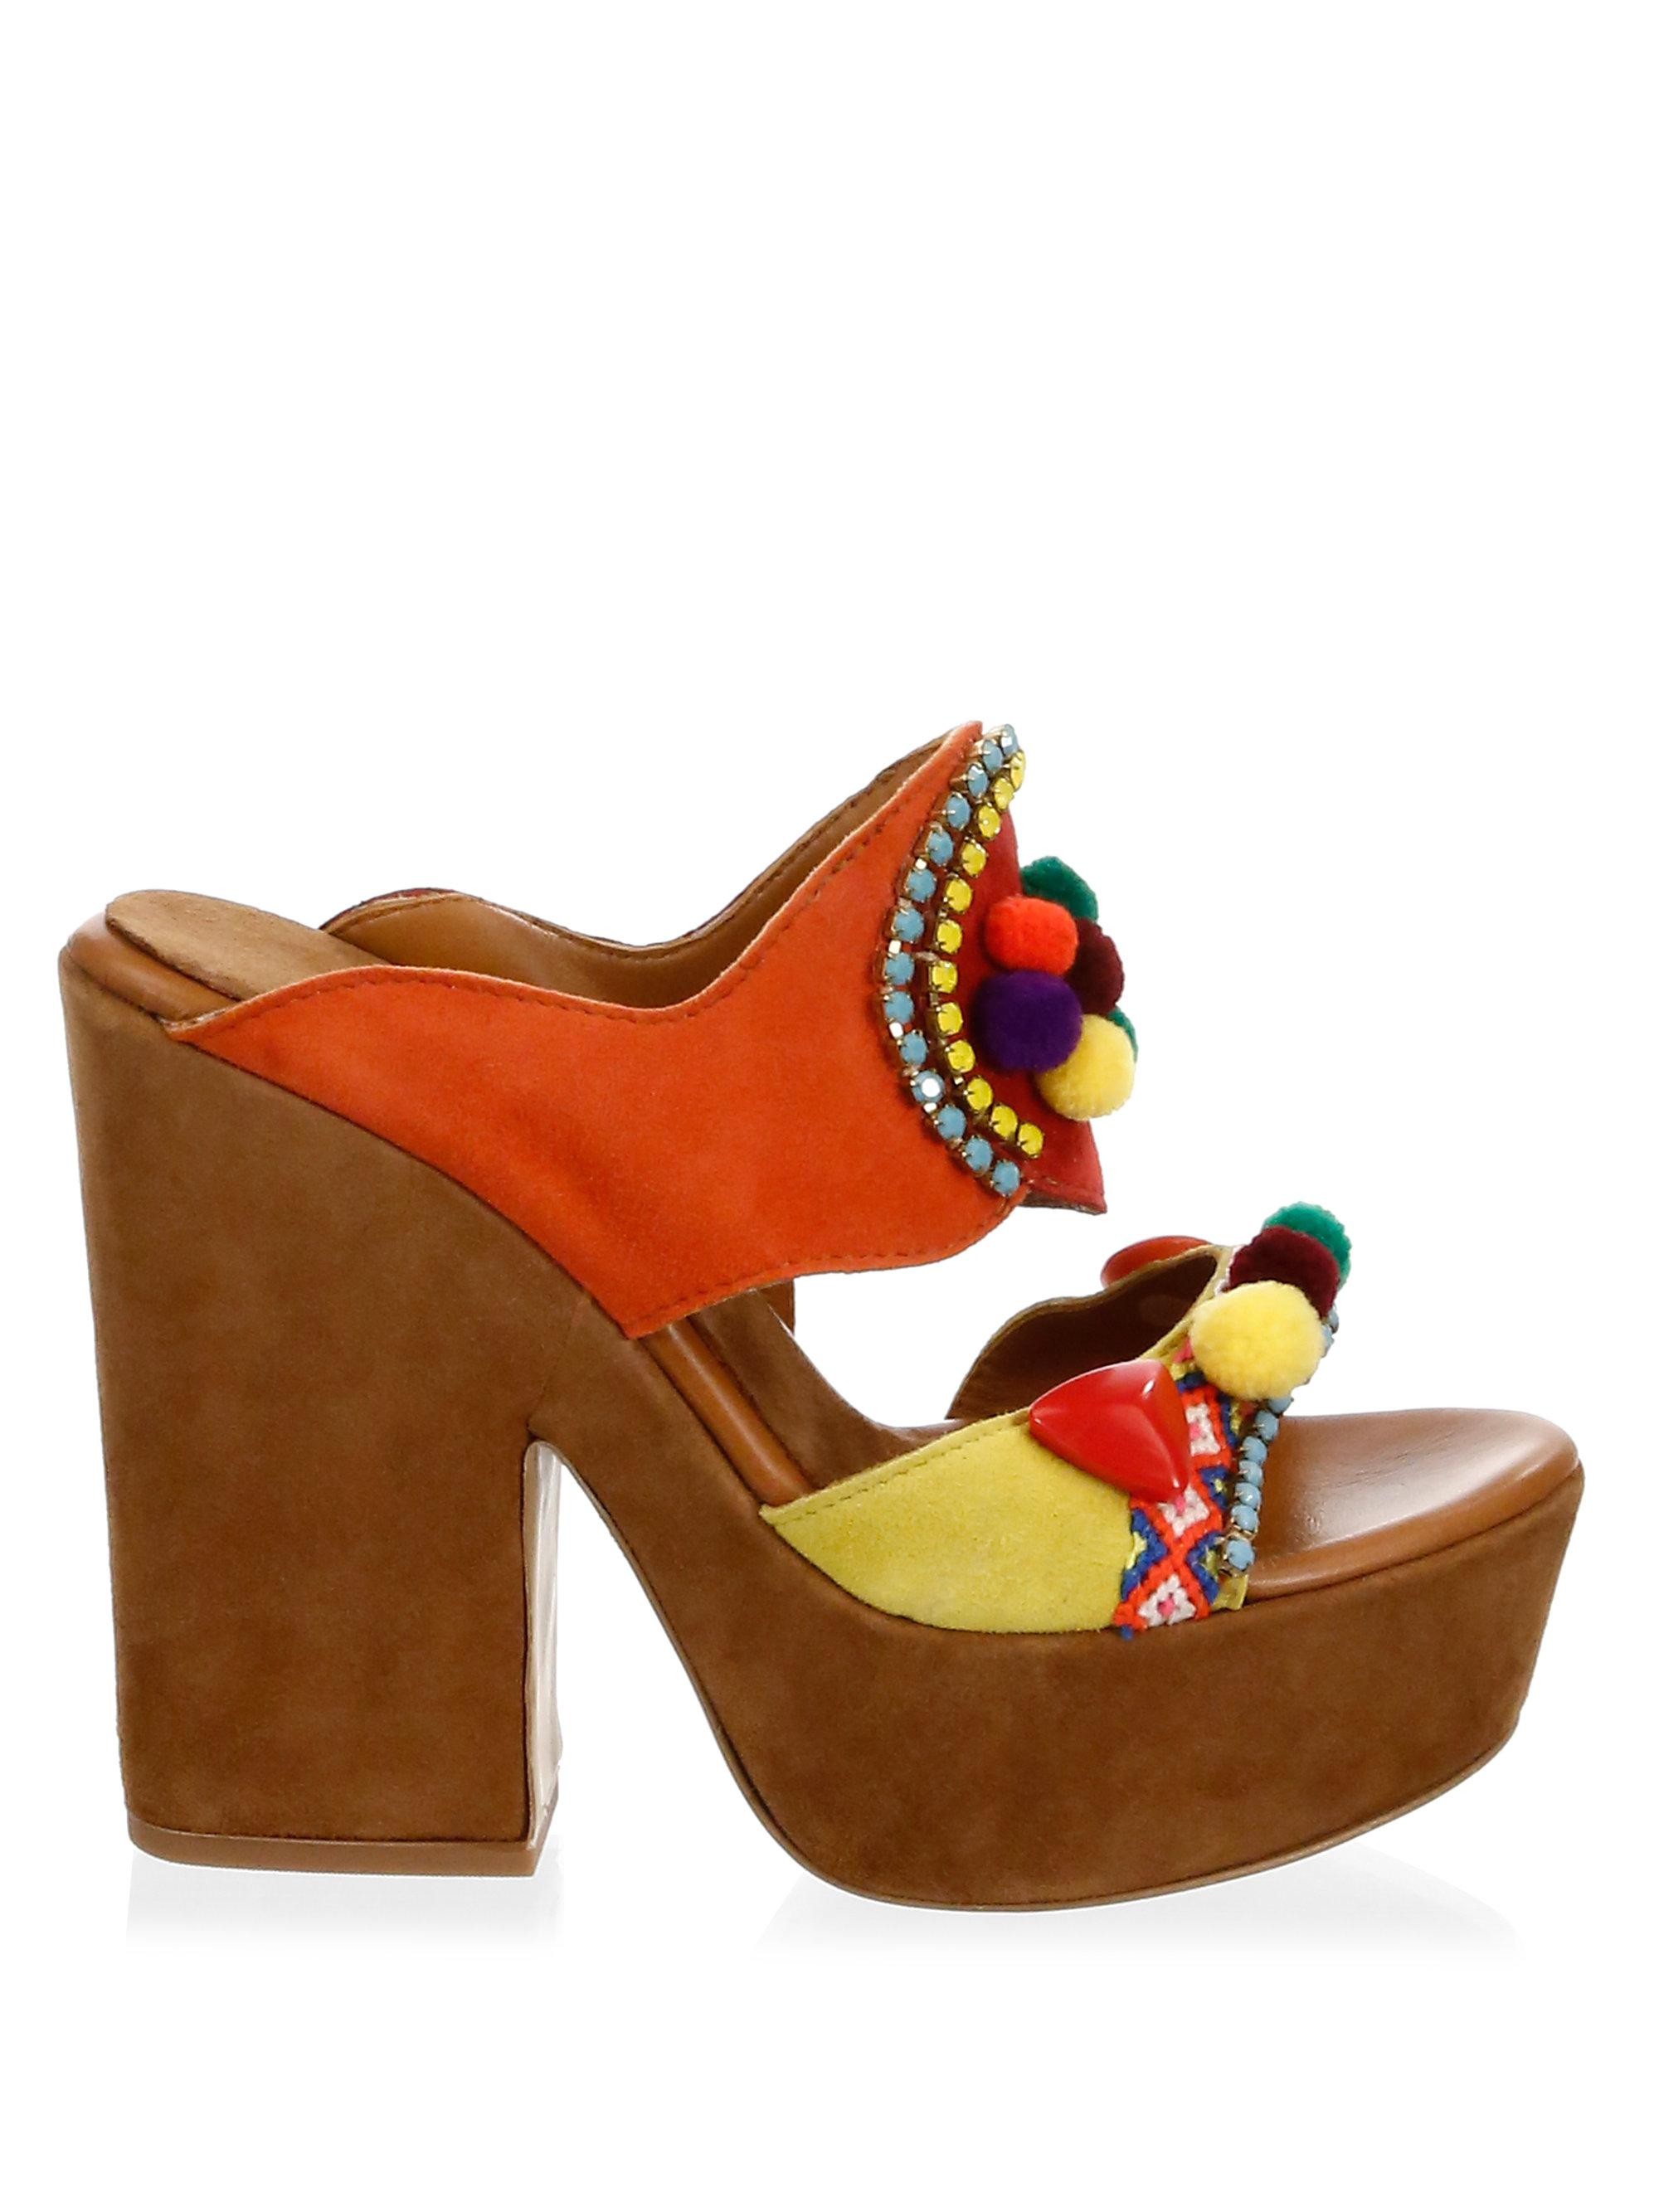 Elina Linardaki La Fiesta Suede Platform Sandals b29na0Ge